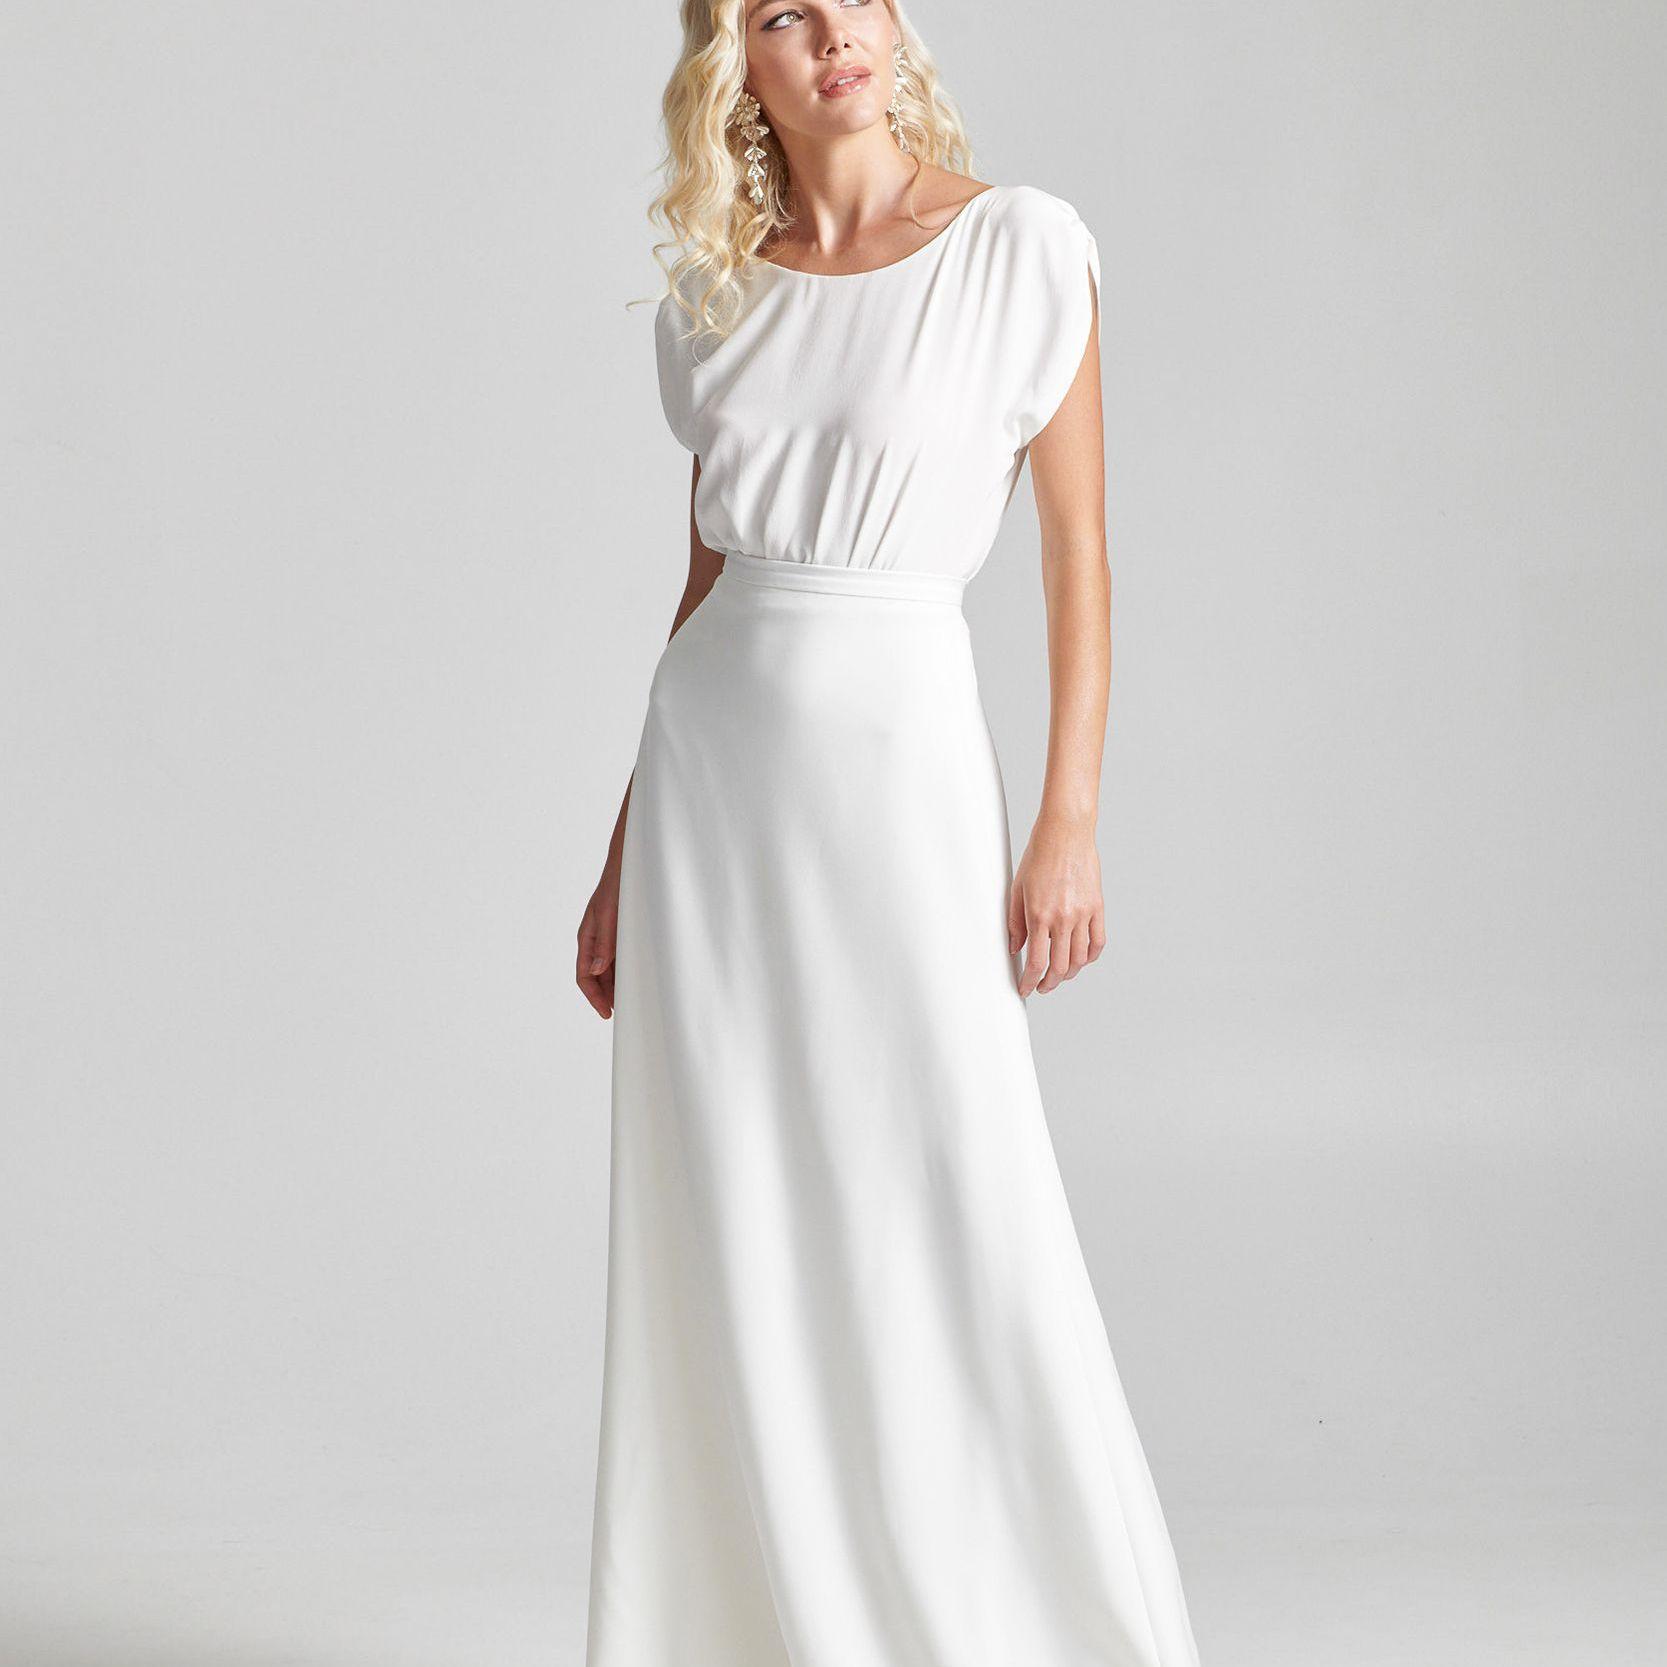 Model in short-sleeve top with floor length skirt